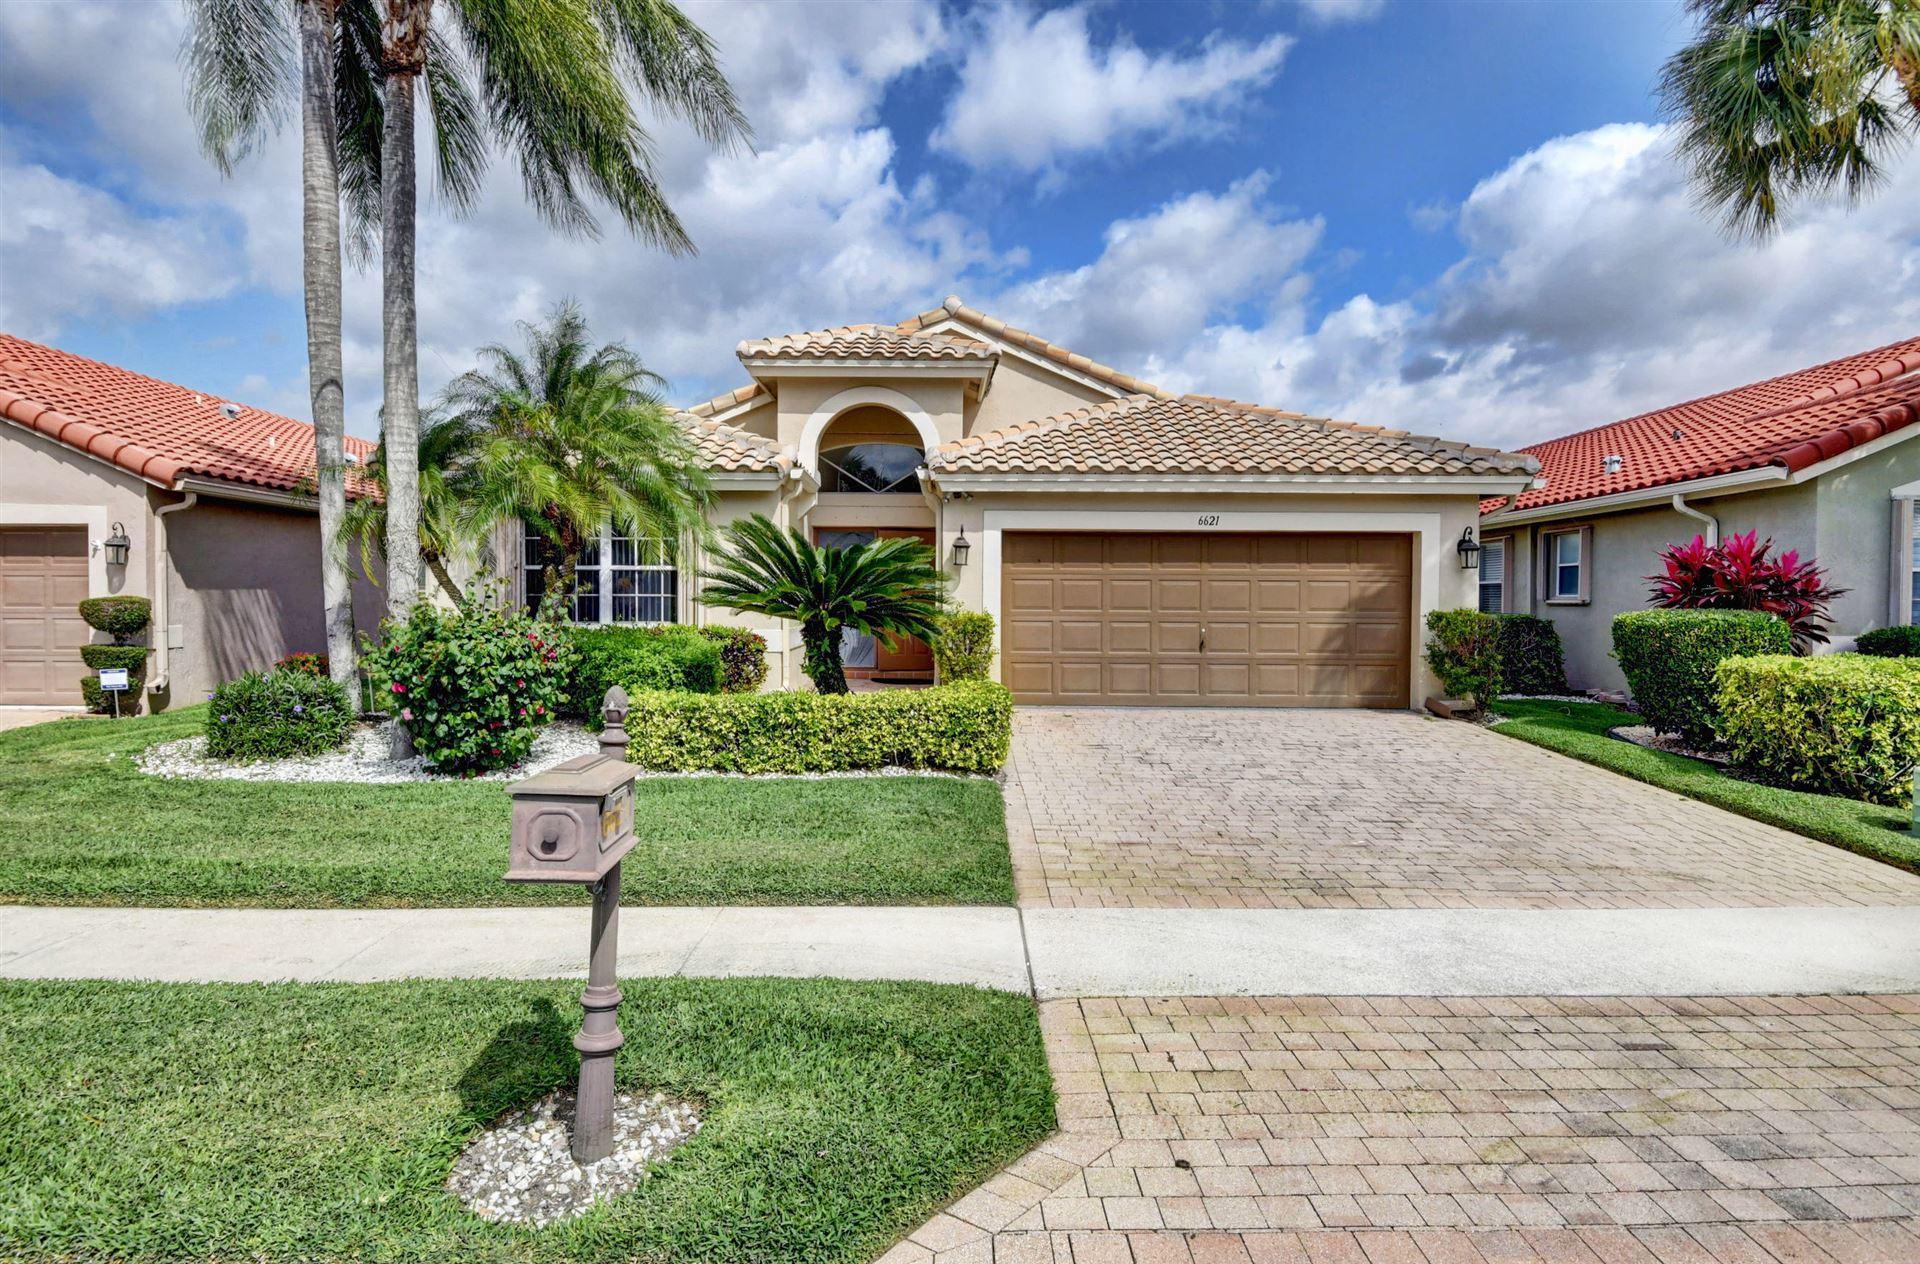 Photo of 6621 Maybrook Road, Boynton Beach, FL 33437 (MLS # RX-10697120)